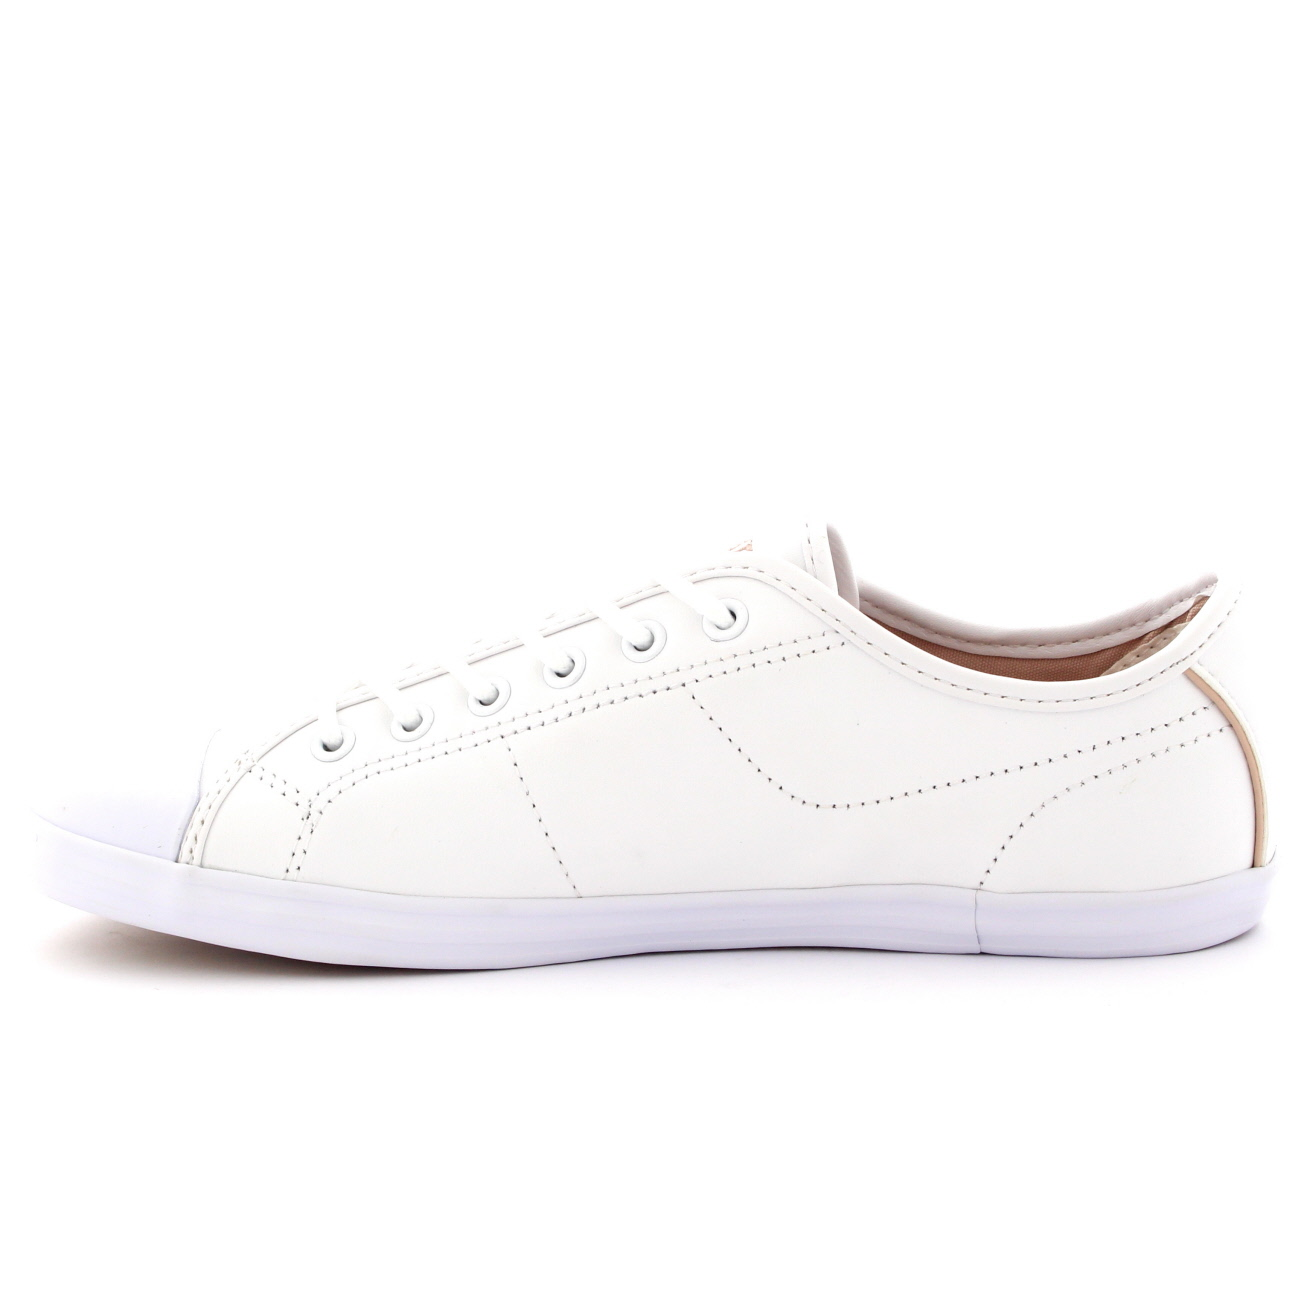 d944c80fe812e lacoste ziane white leather plimsoll trainers